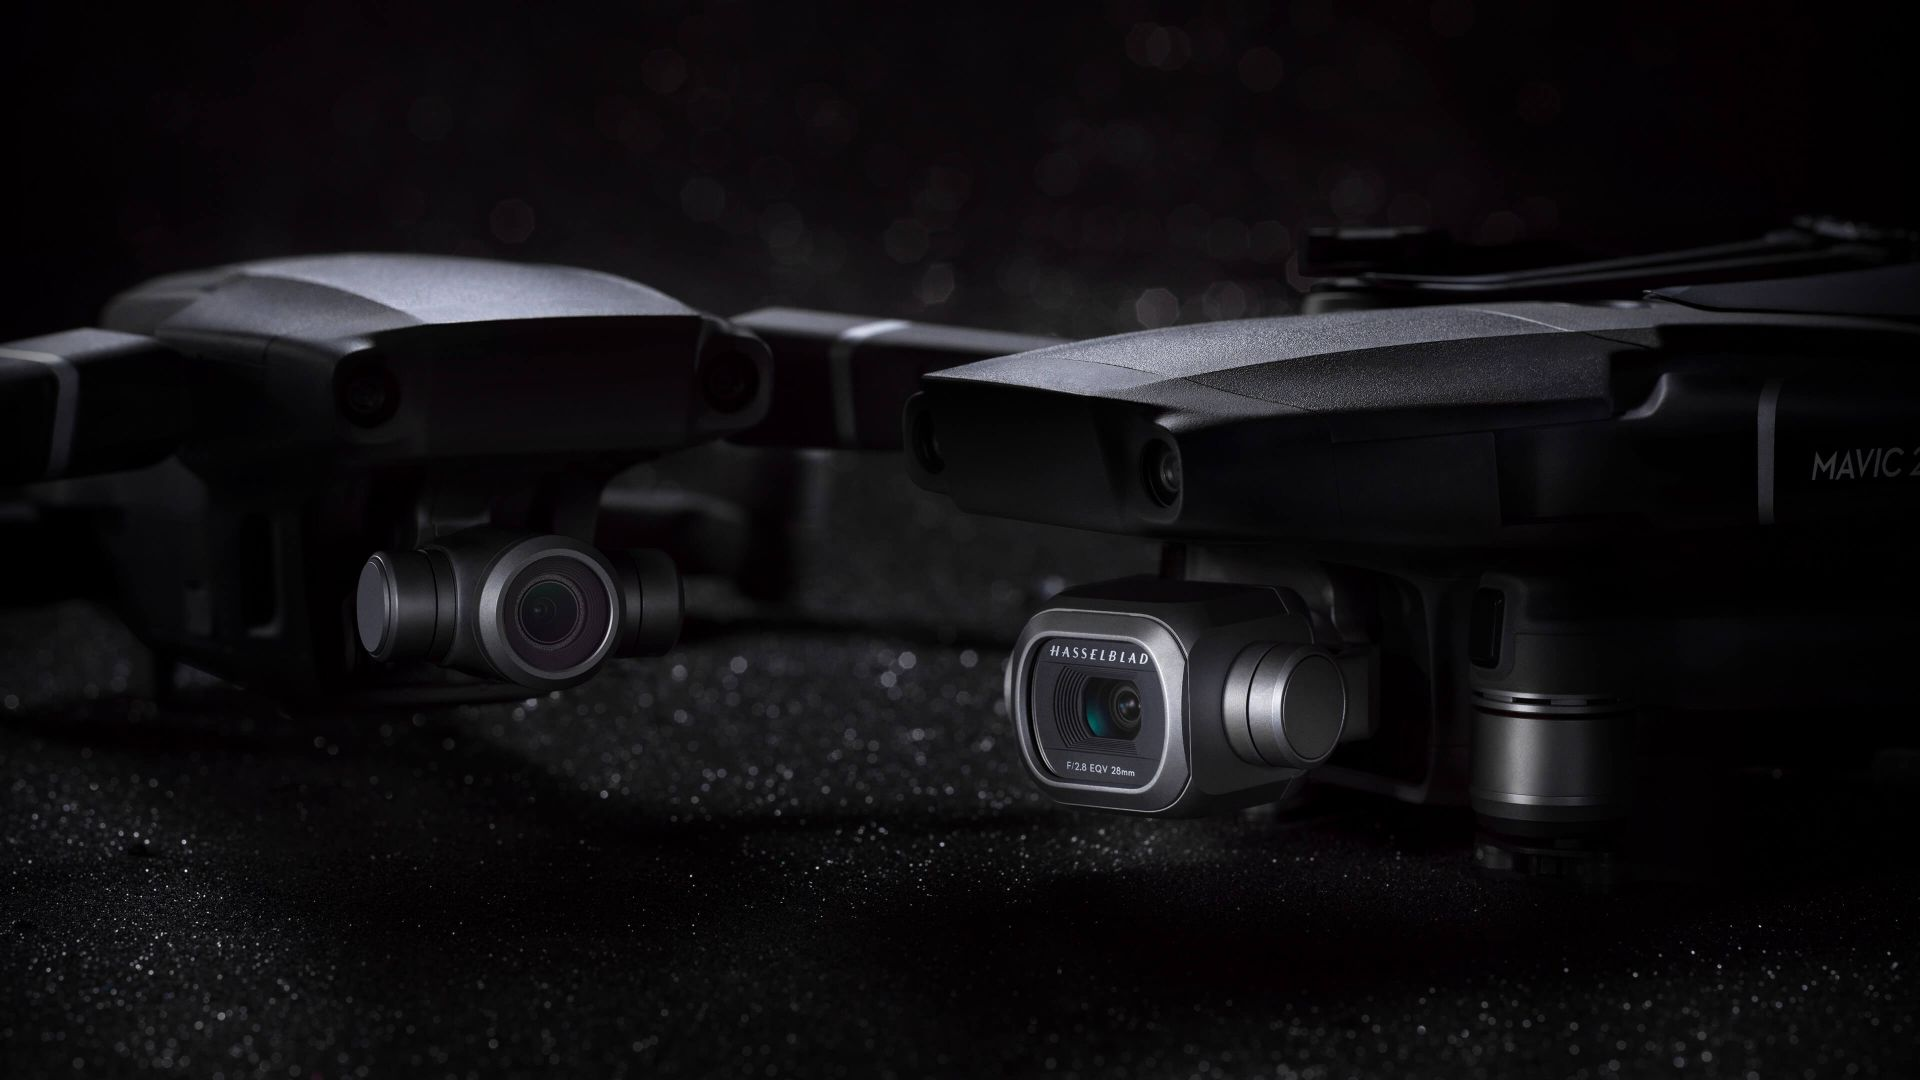 Wallpaper Dji Mavic 2 Pro  Best Drones  5k  Hi